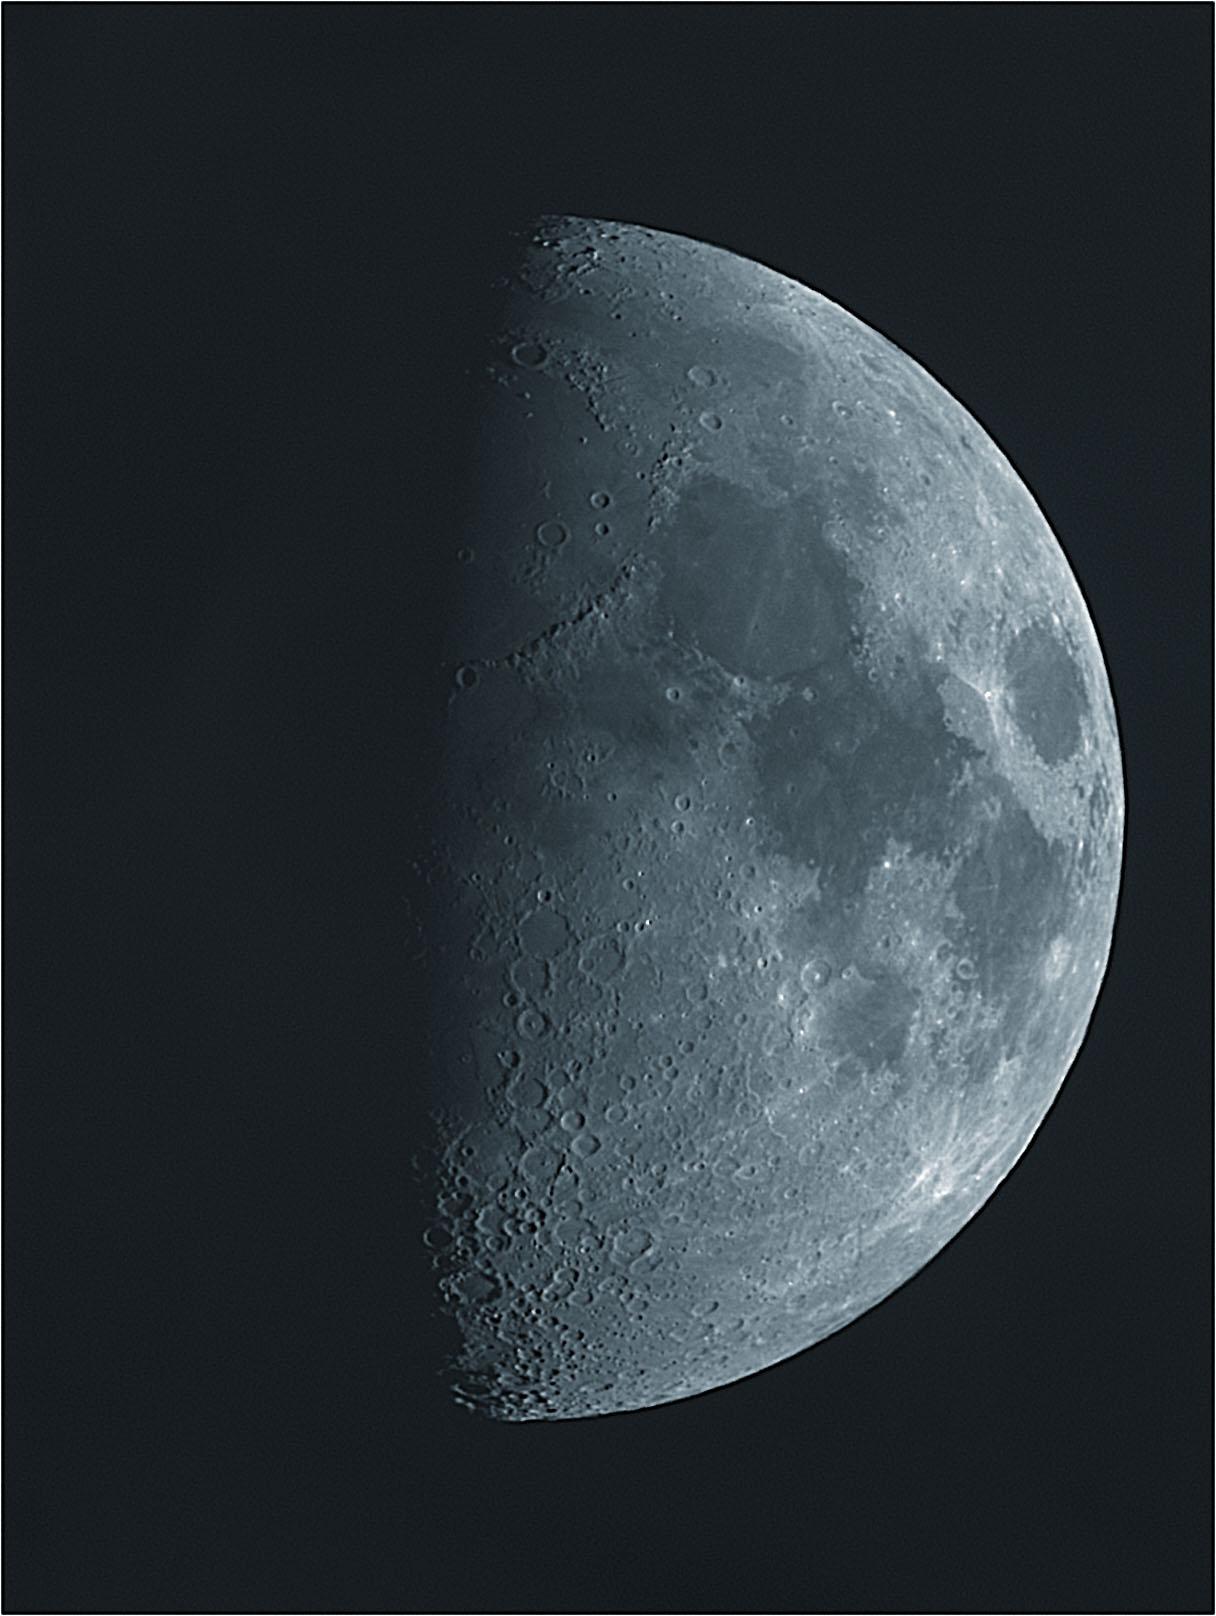 Gibbous Moon - Mar 1, 2012